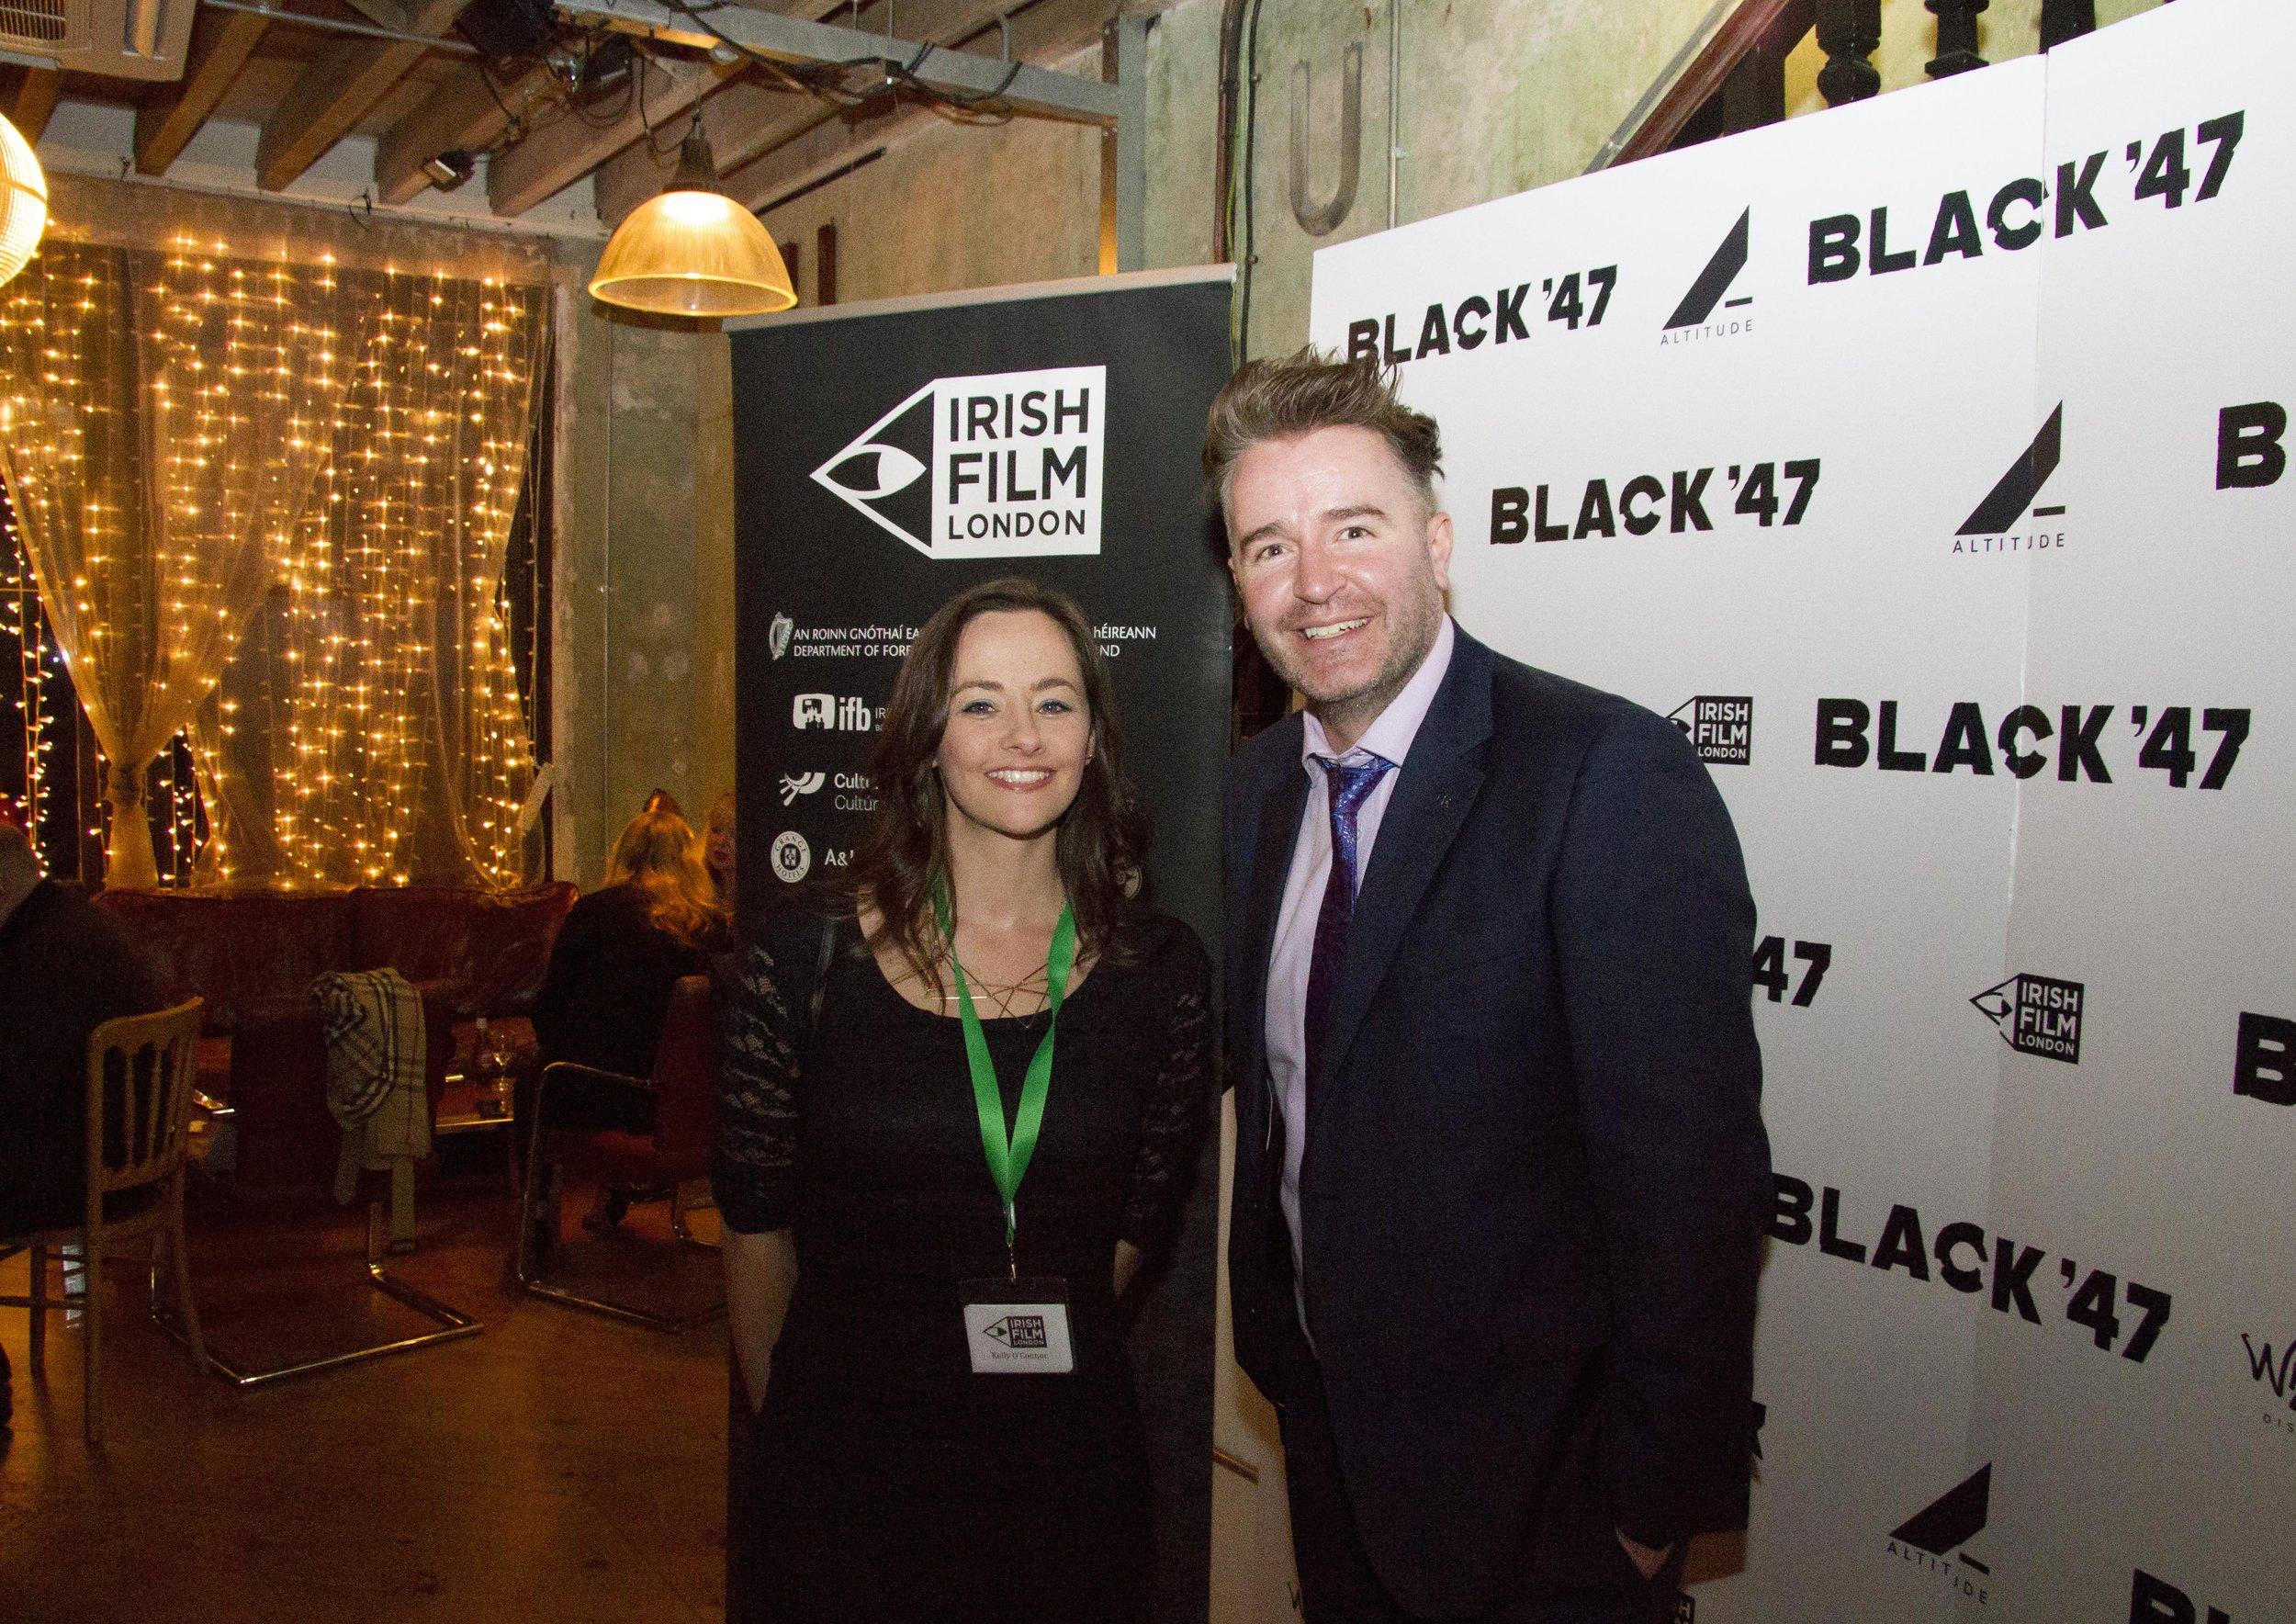 Black 47 London Premiere 2018 Photos courtesy of Noel Mullen Irish Film London 59.jpg